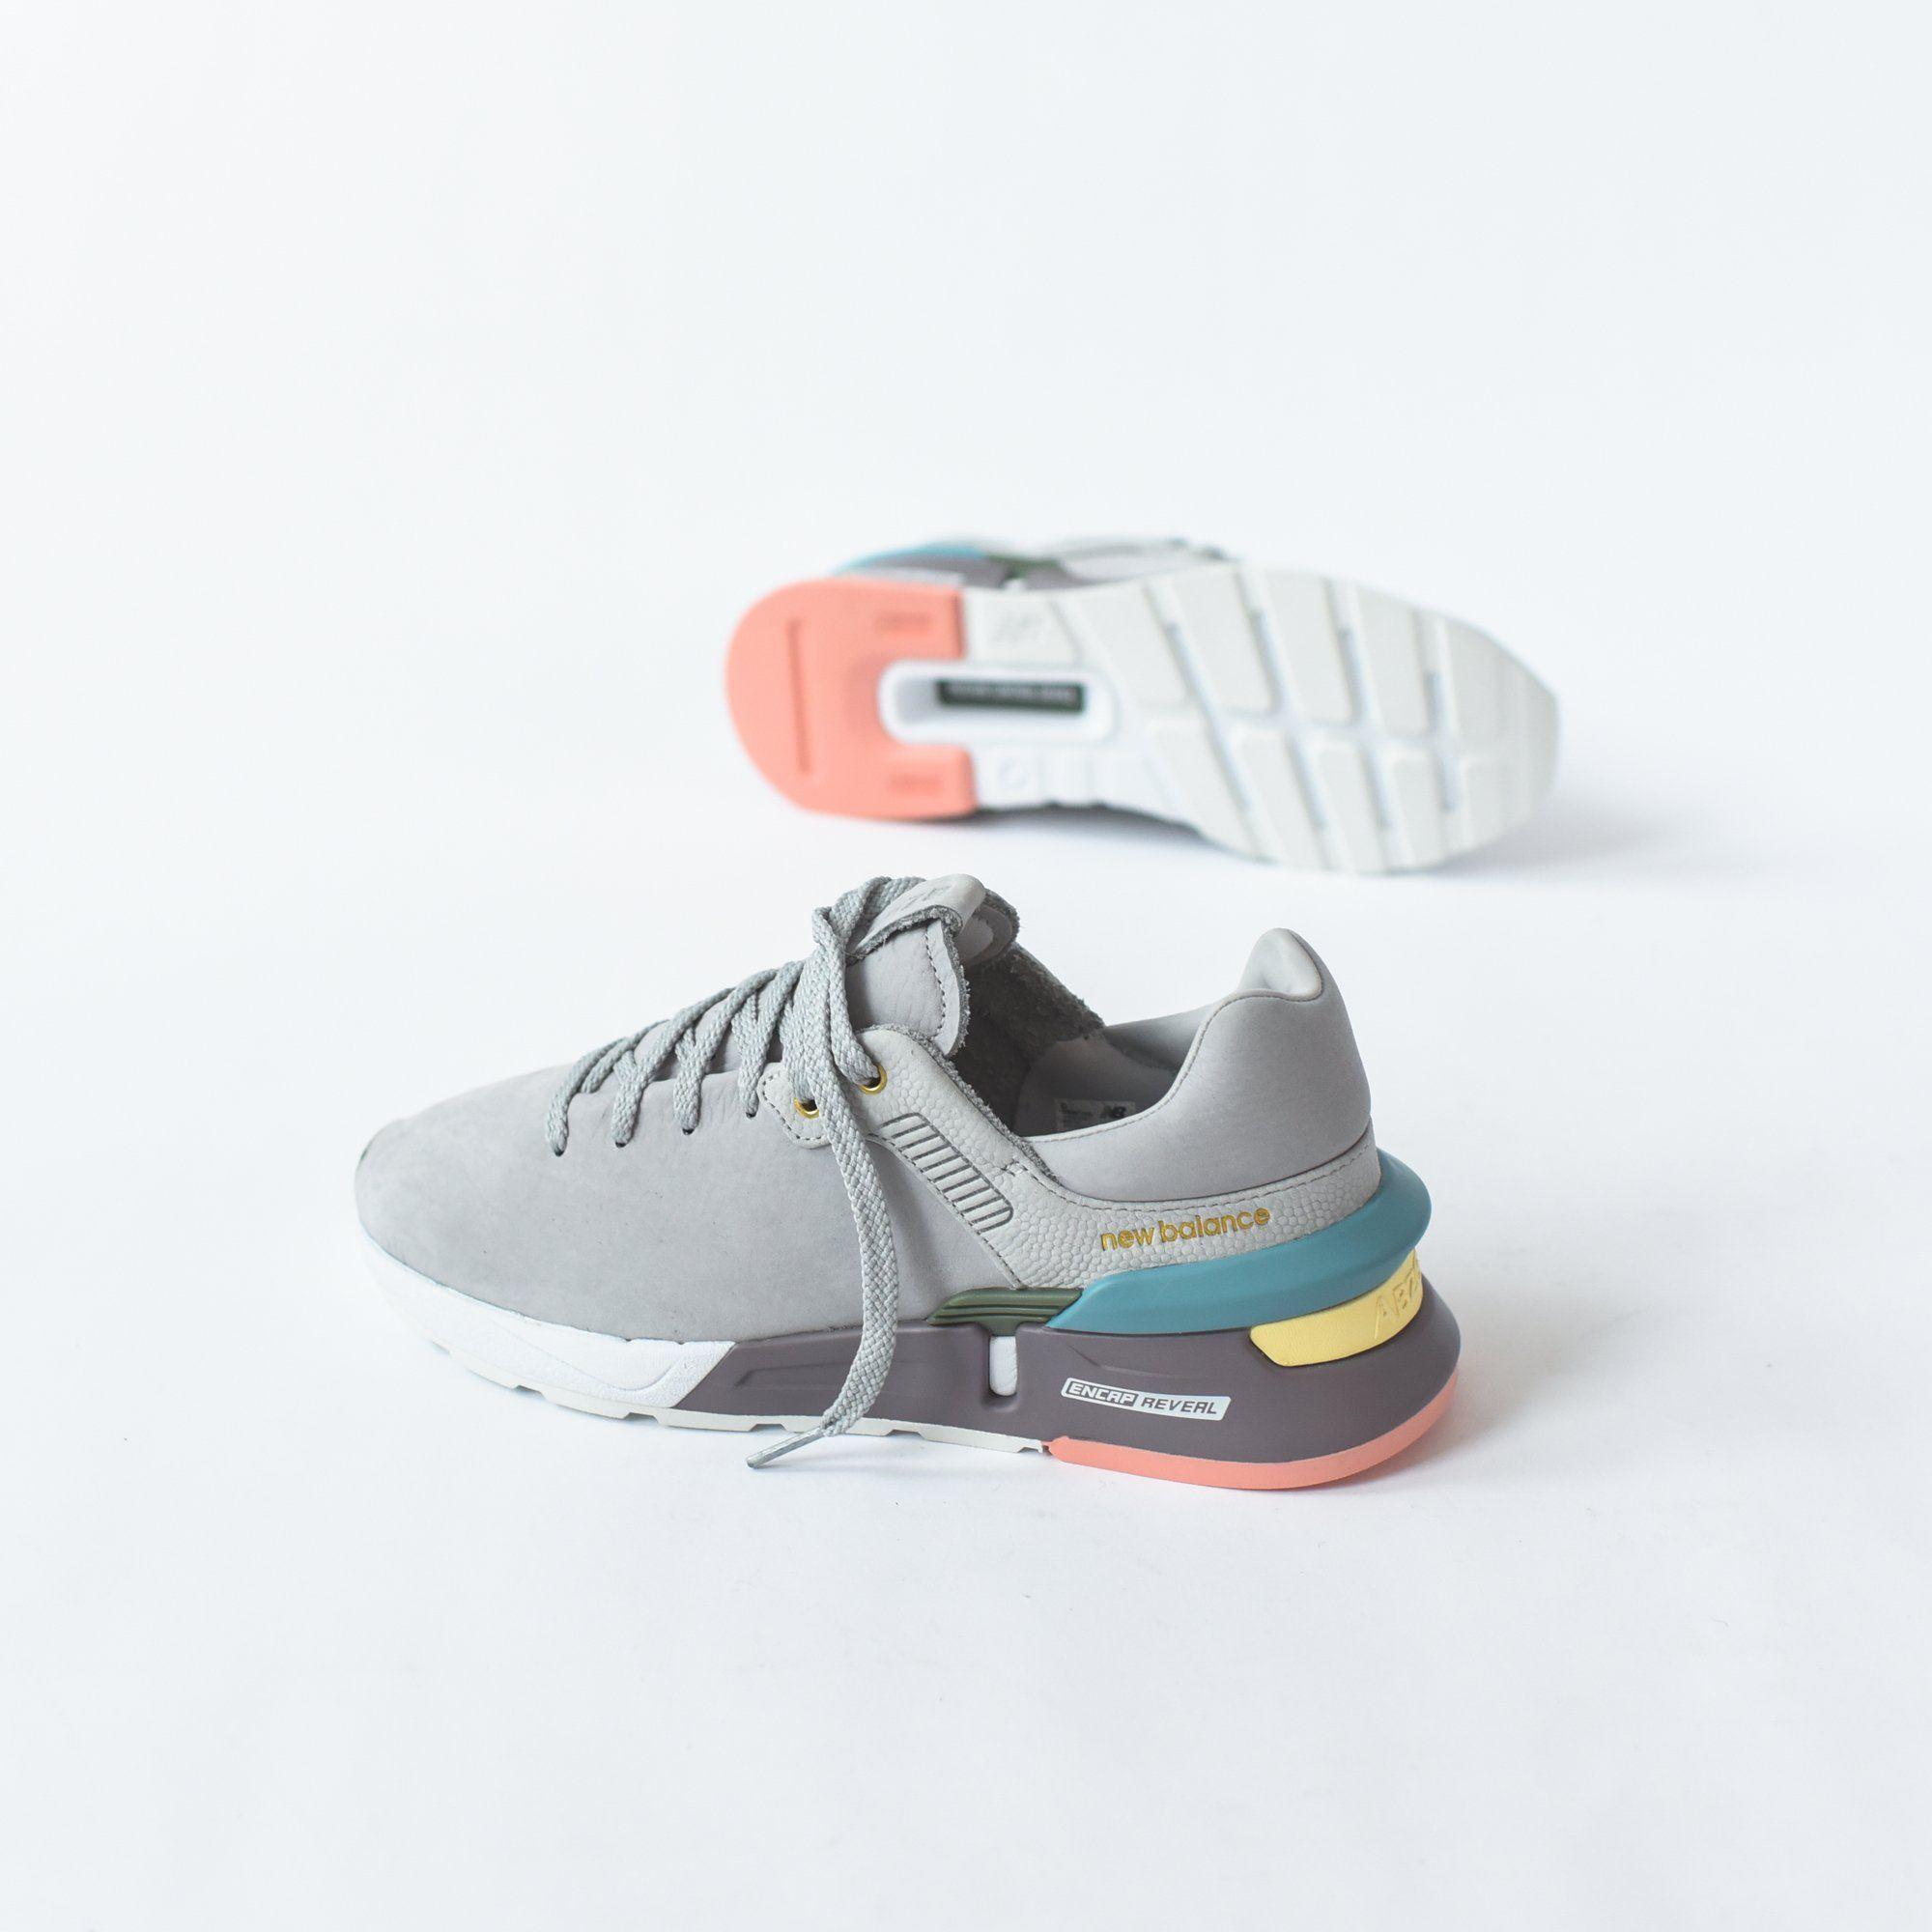 New Balance by Tokyo Design Studio 997 Sport Grey